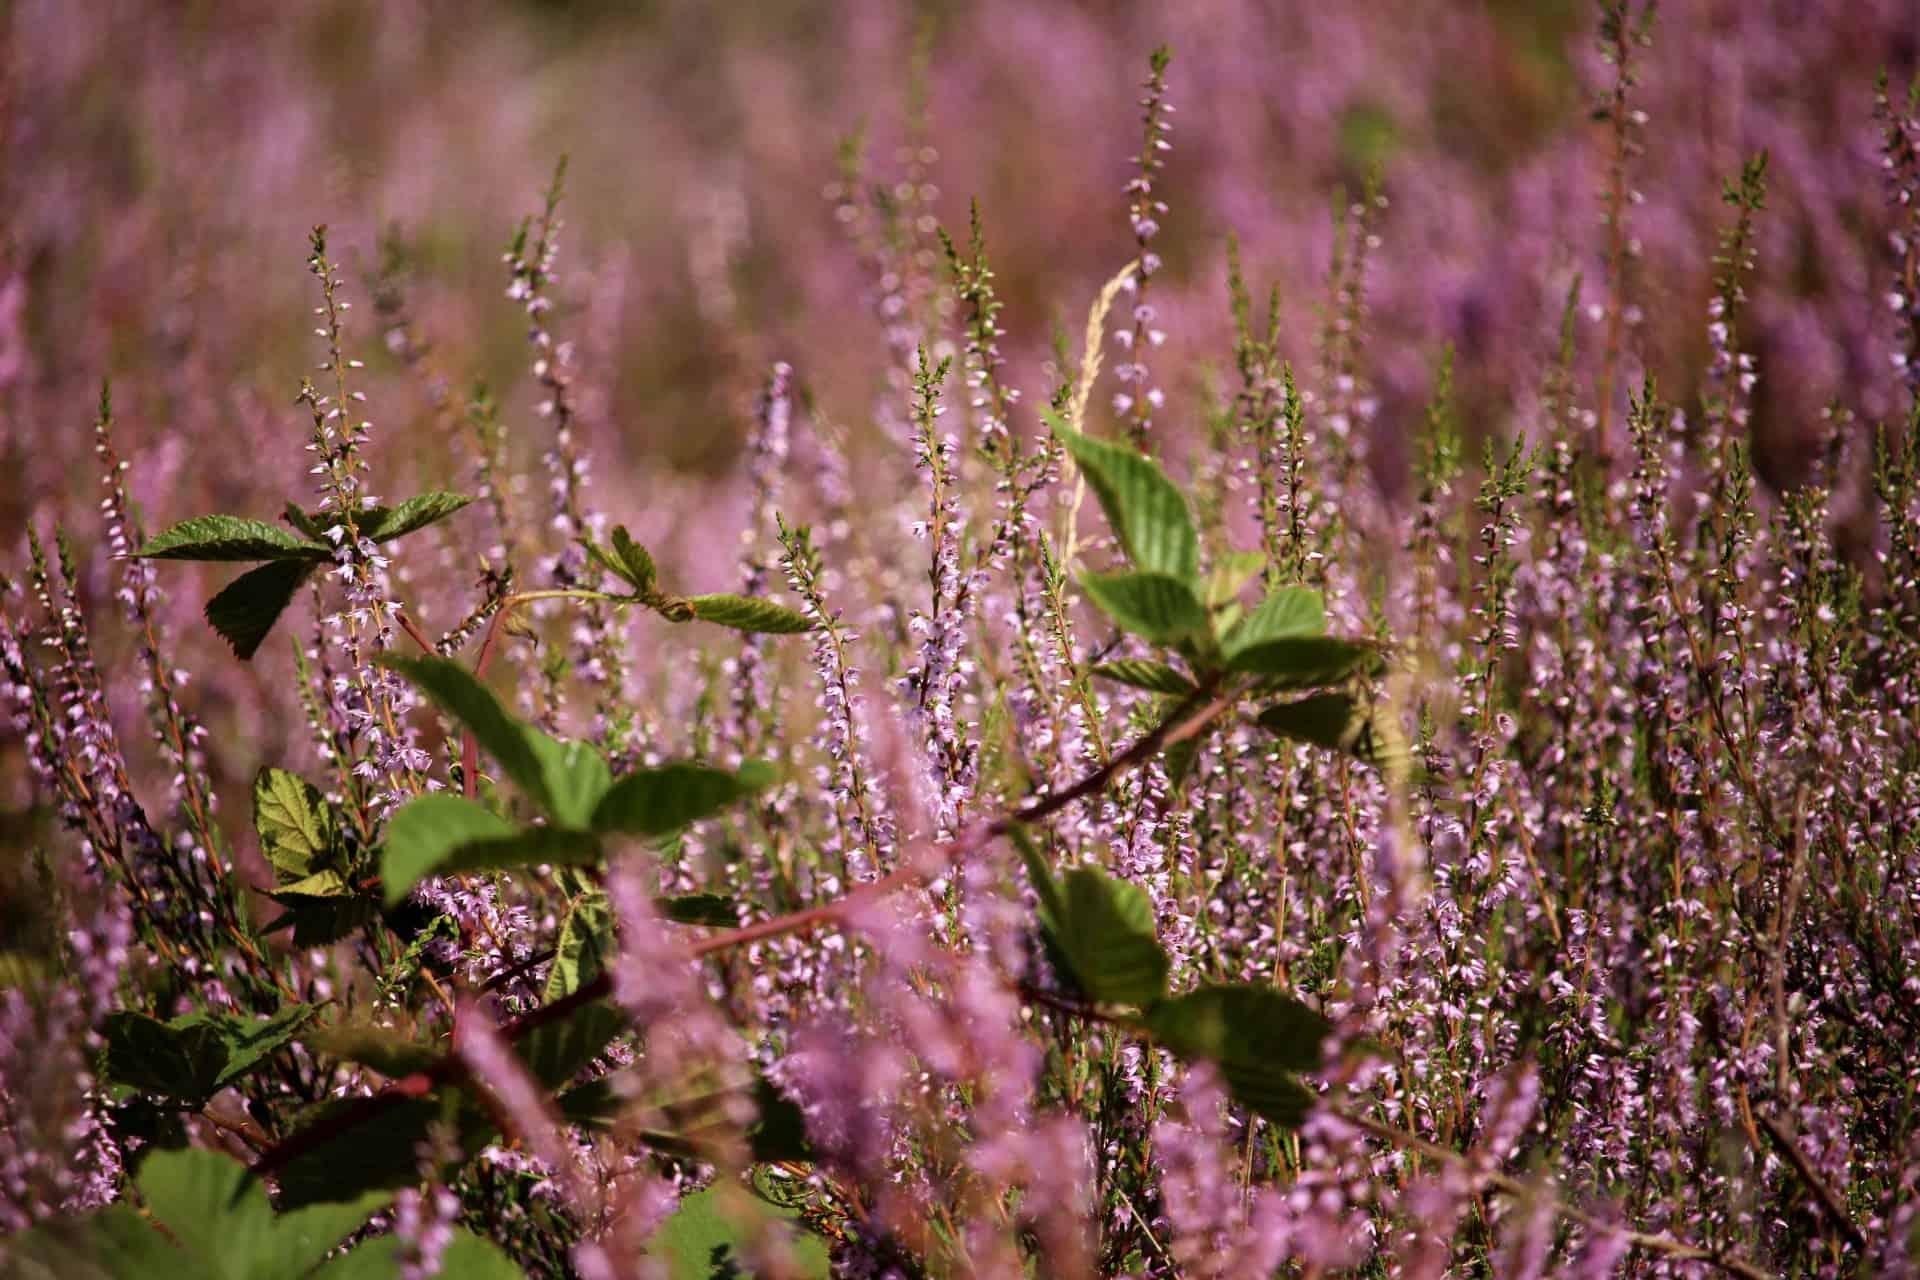 Blühende Heide (Calluna vulgaris)